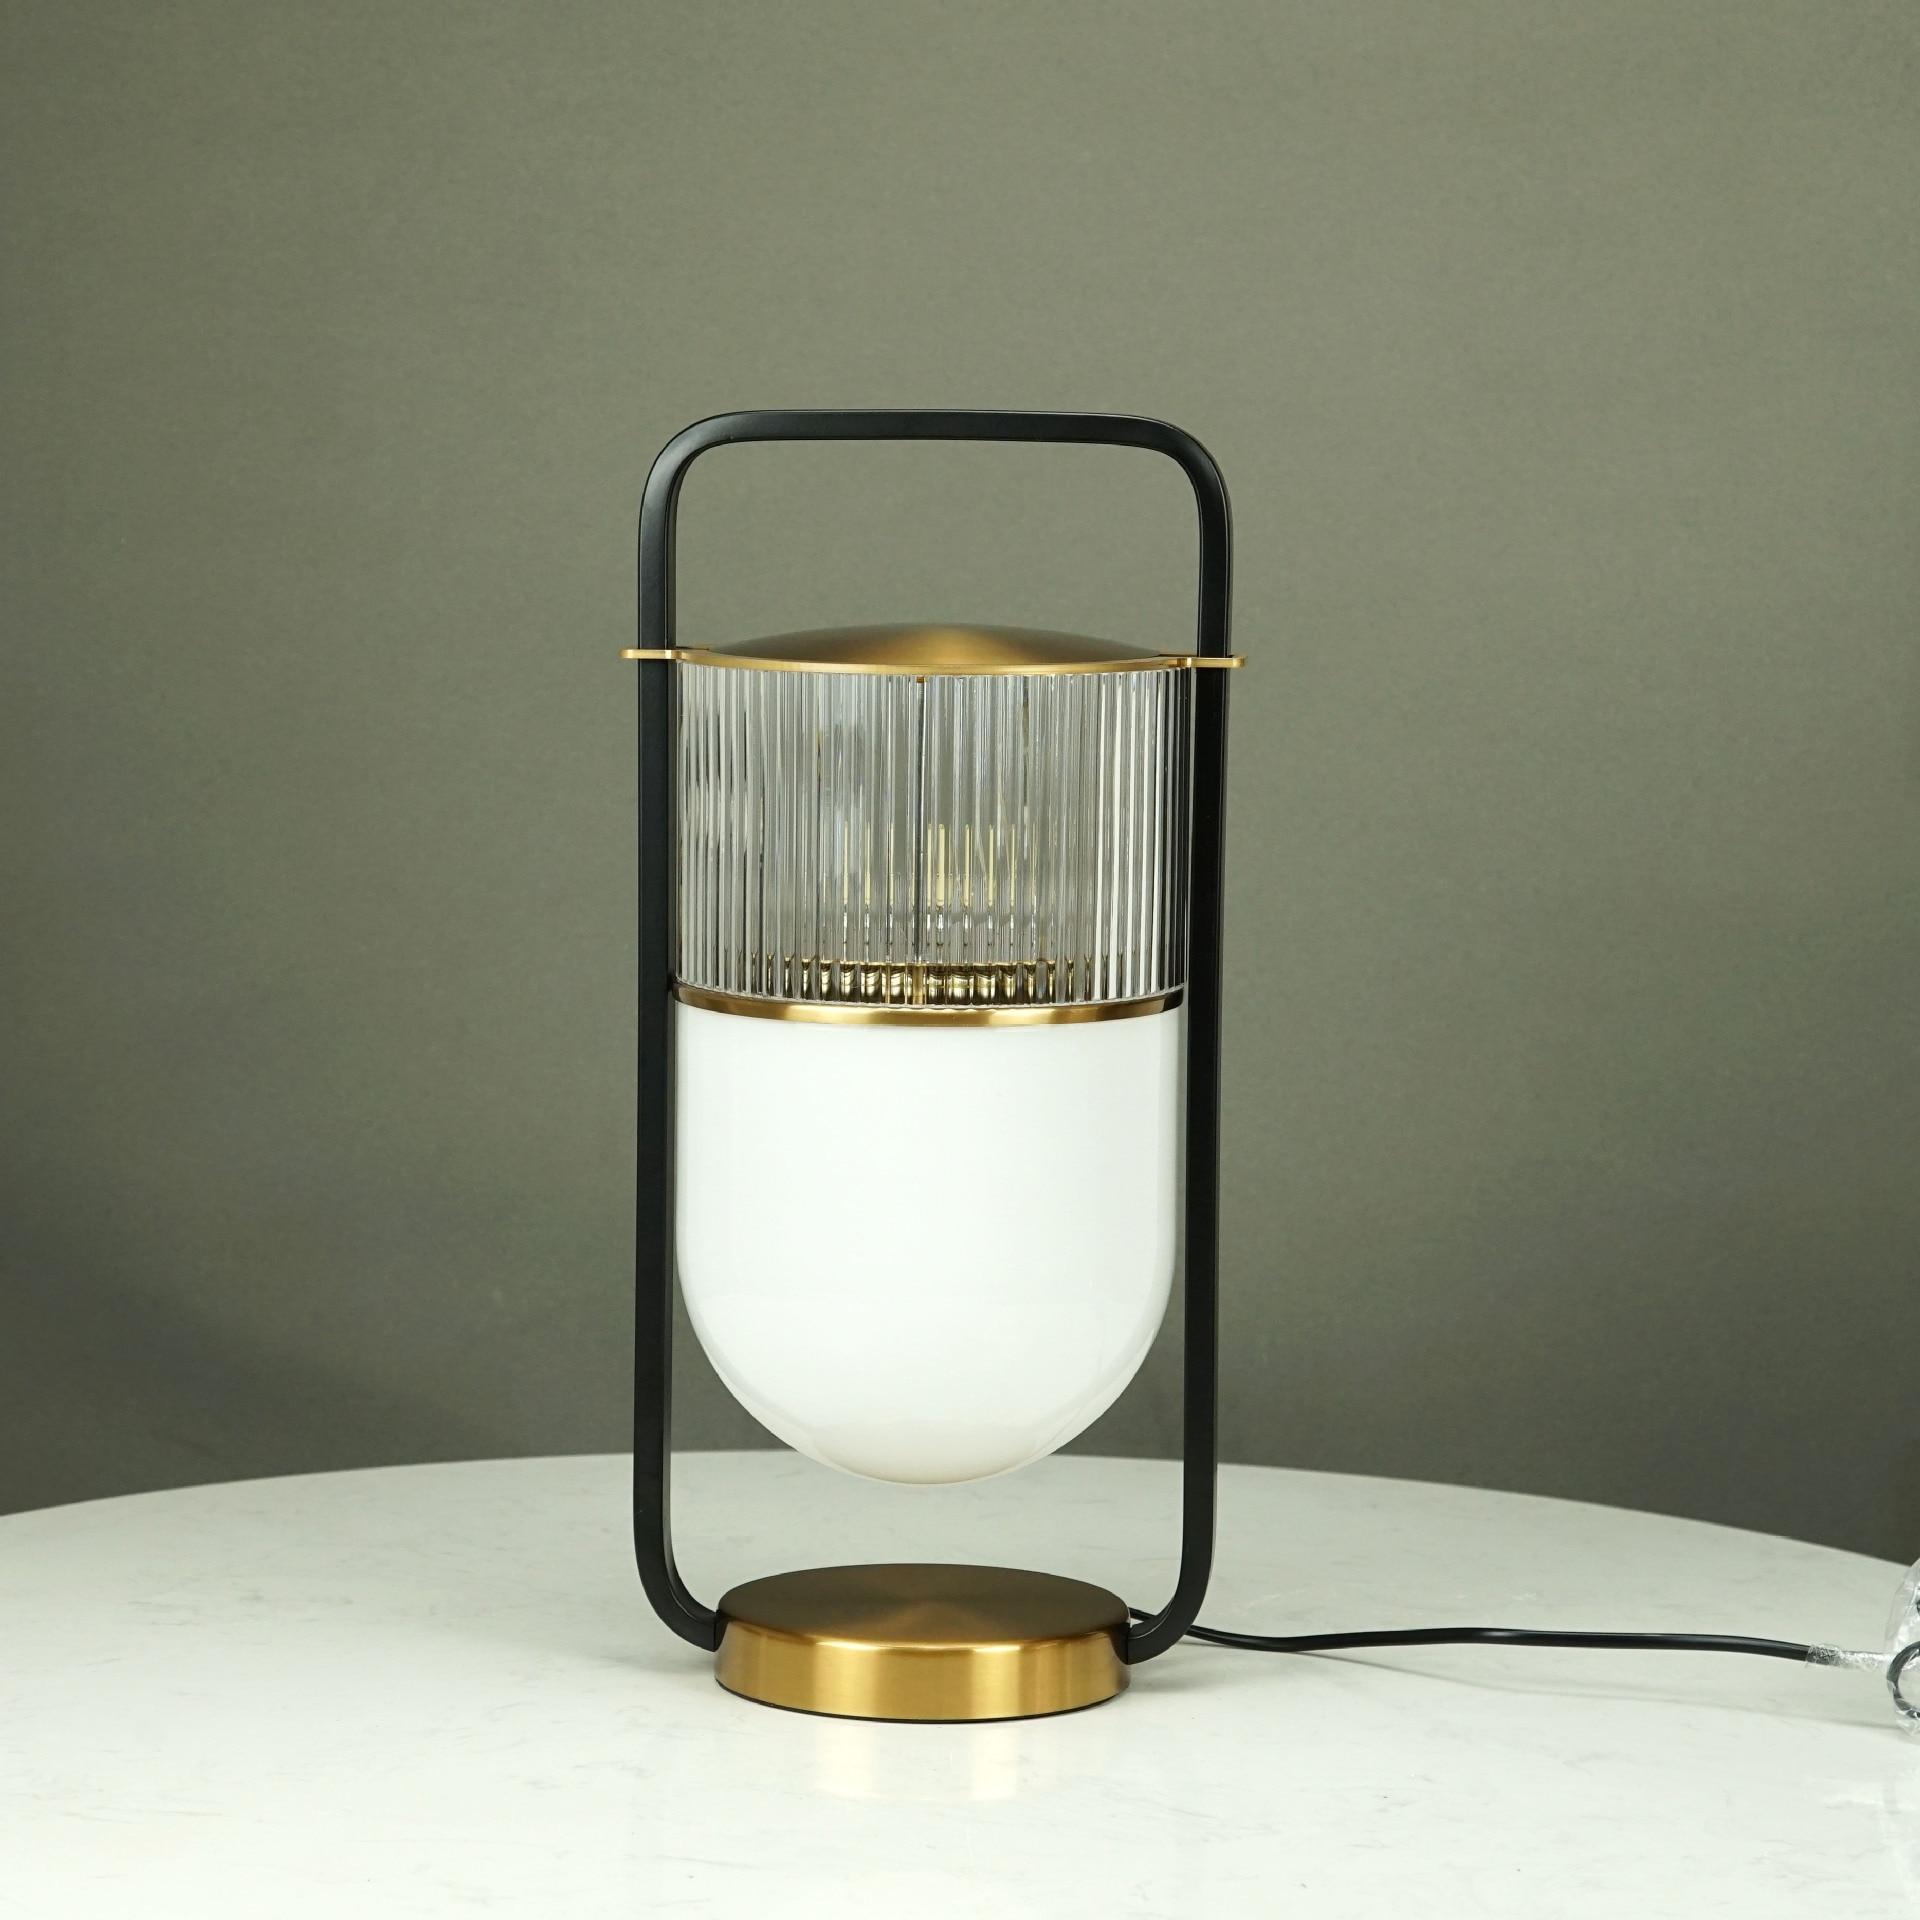 Nordic Simple Personality Designer Metal Living Room Table Lamp New Chinese Lantern Modern Bedroom Bedside Table Lamp Led Table Lamps Aliexpress